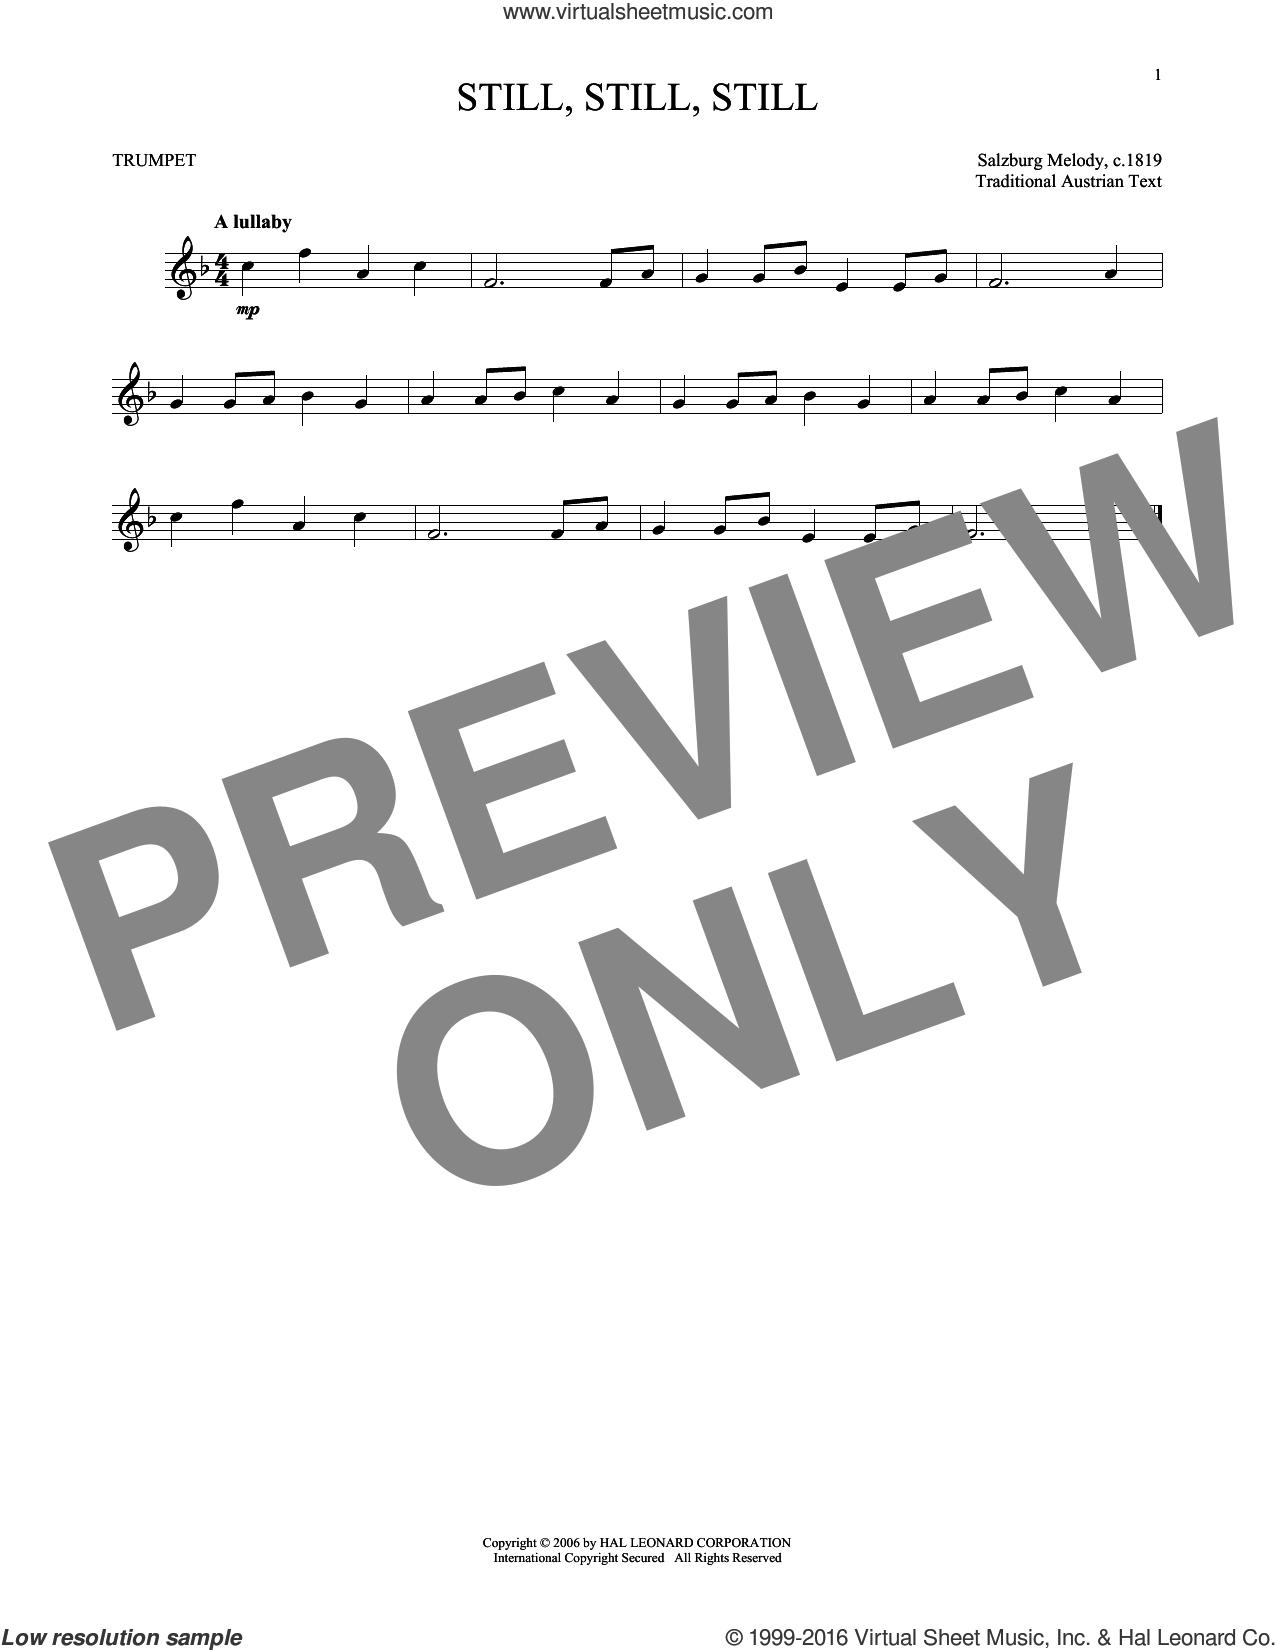 Still, Still, Still sheet music for trumpet solo by Salzburg Melody c.1819 and Miscellaneous, intermediate skill level